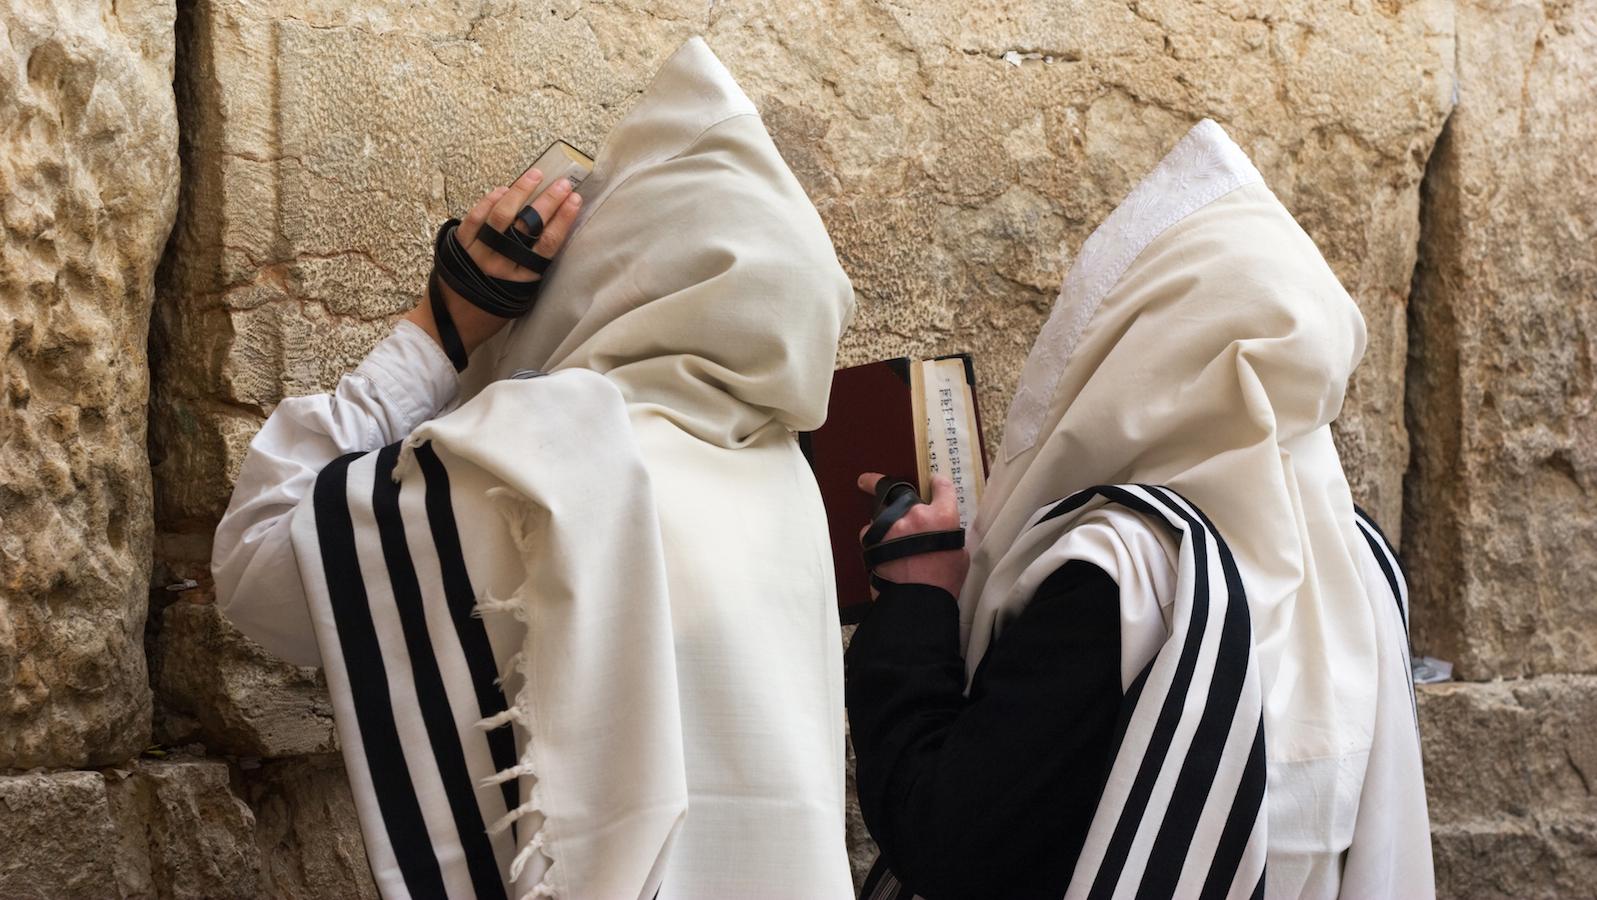 symbolism in the shawl